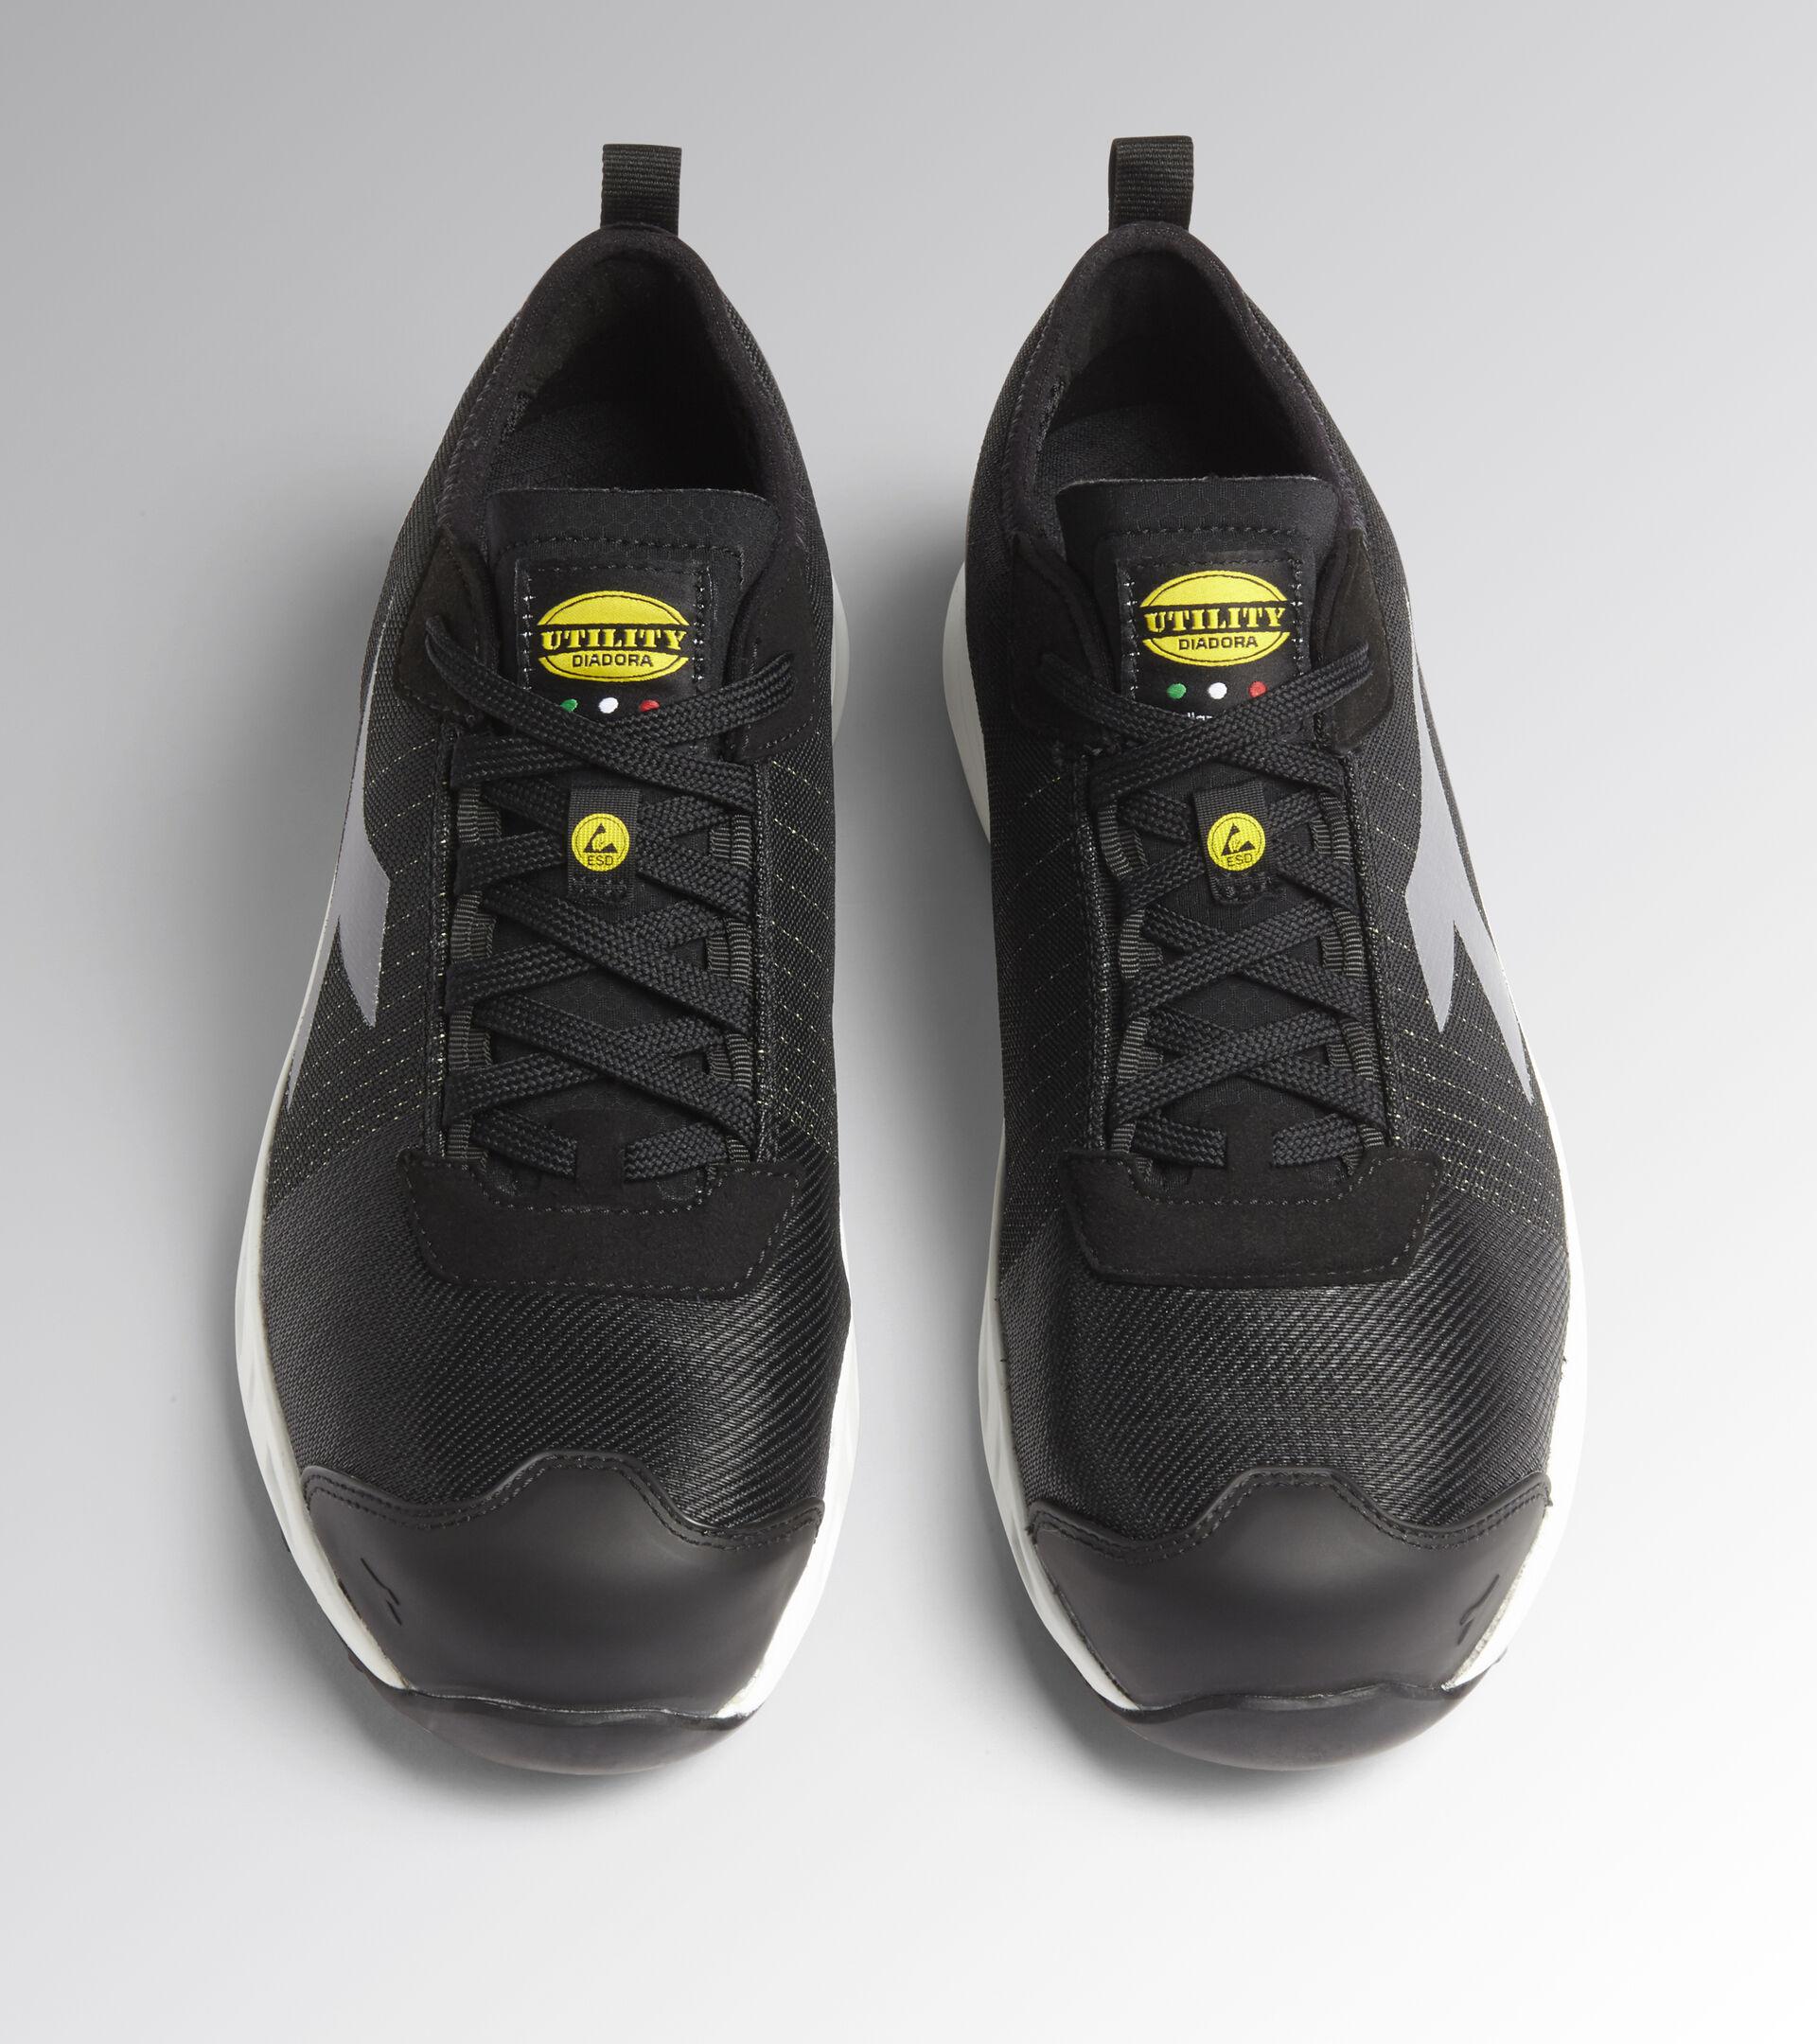 Low safety shoe FLY LITEBASE MATRYX LOW S3 HRO SRC ESD BLACK /WHITE - Utility